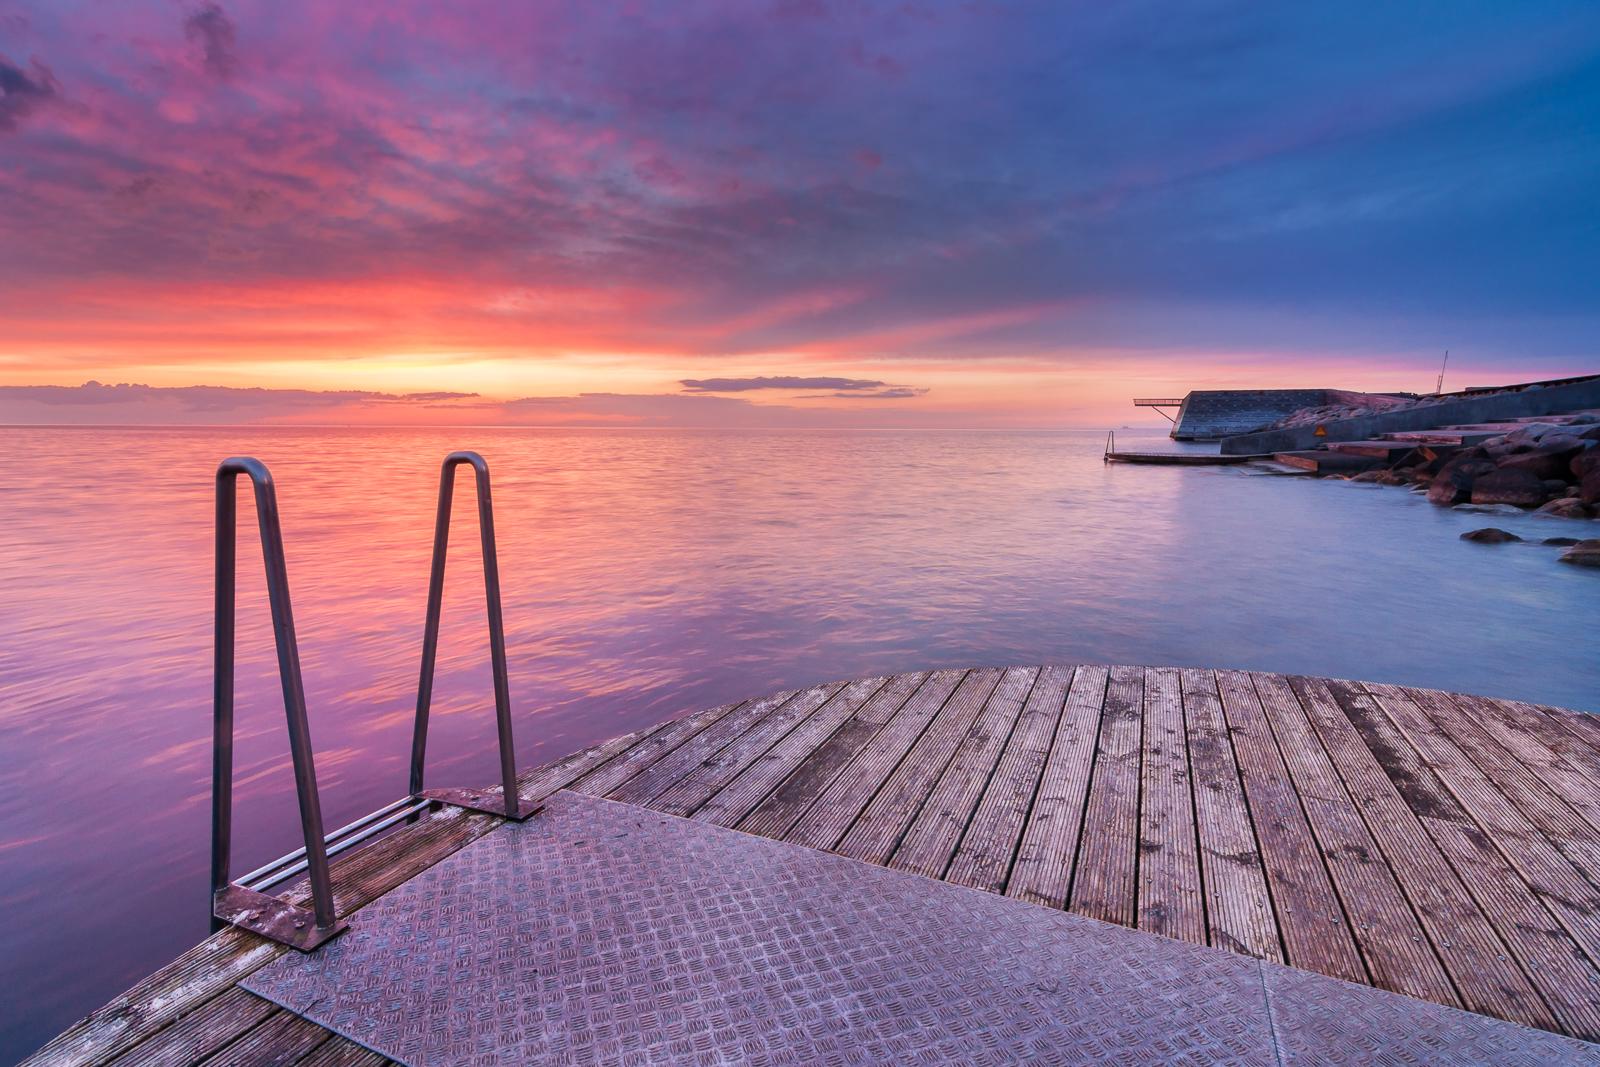 Beautiful sunset at the boardwalk